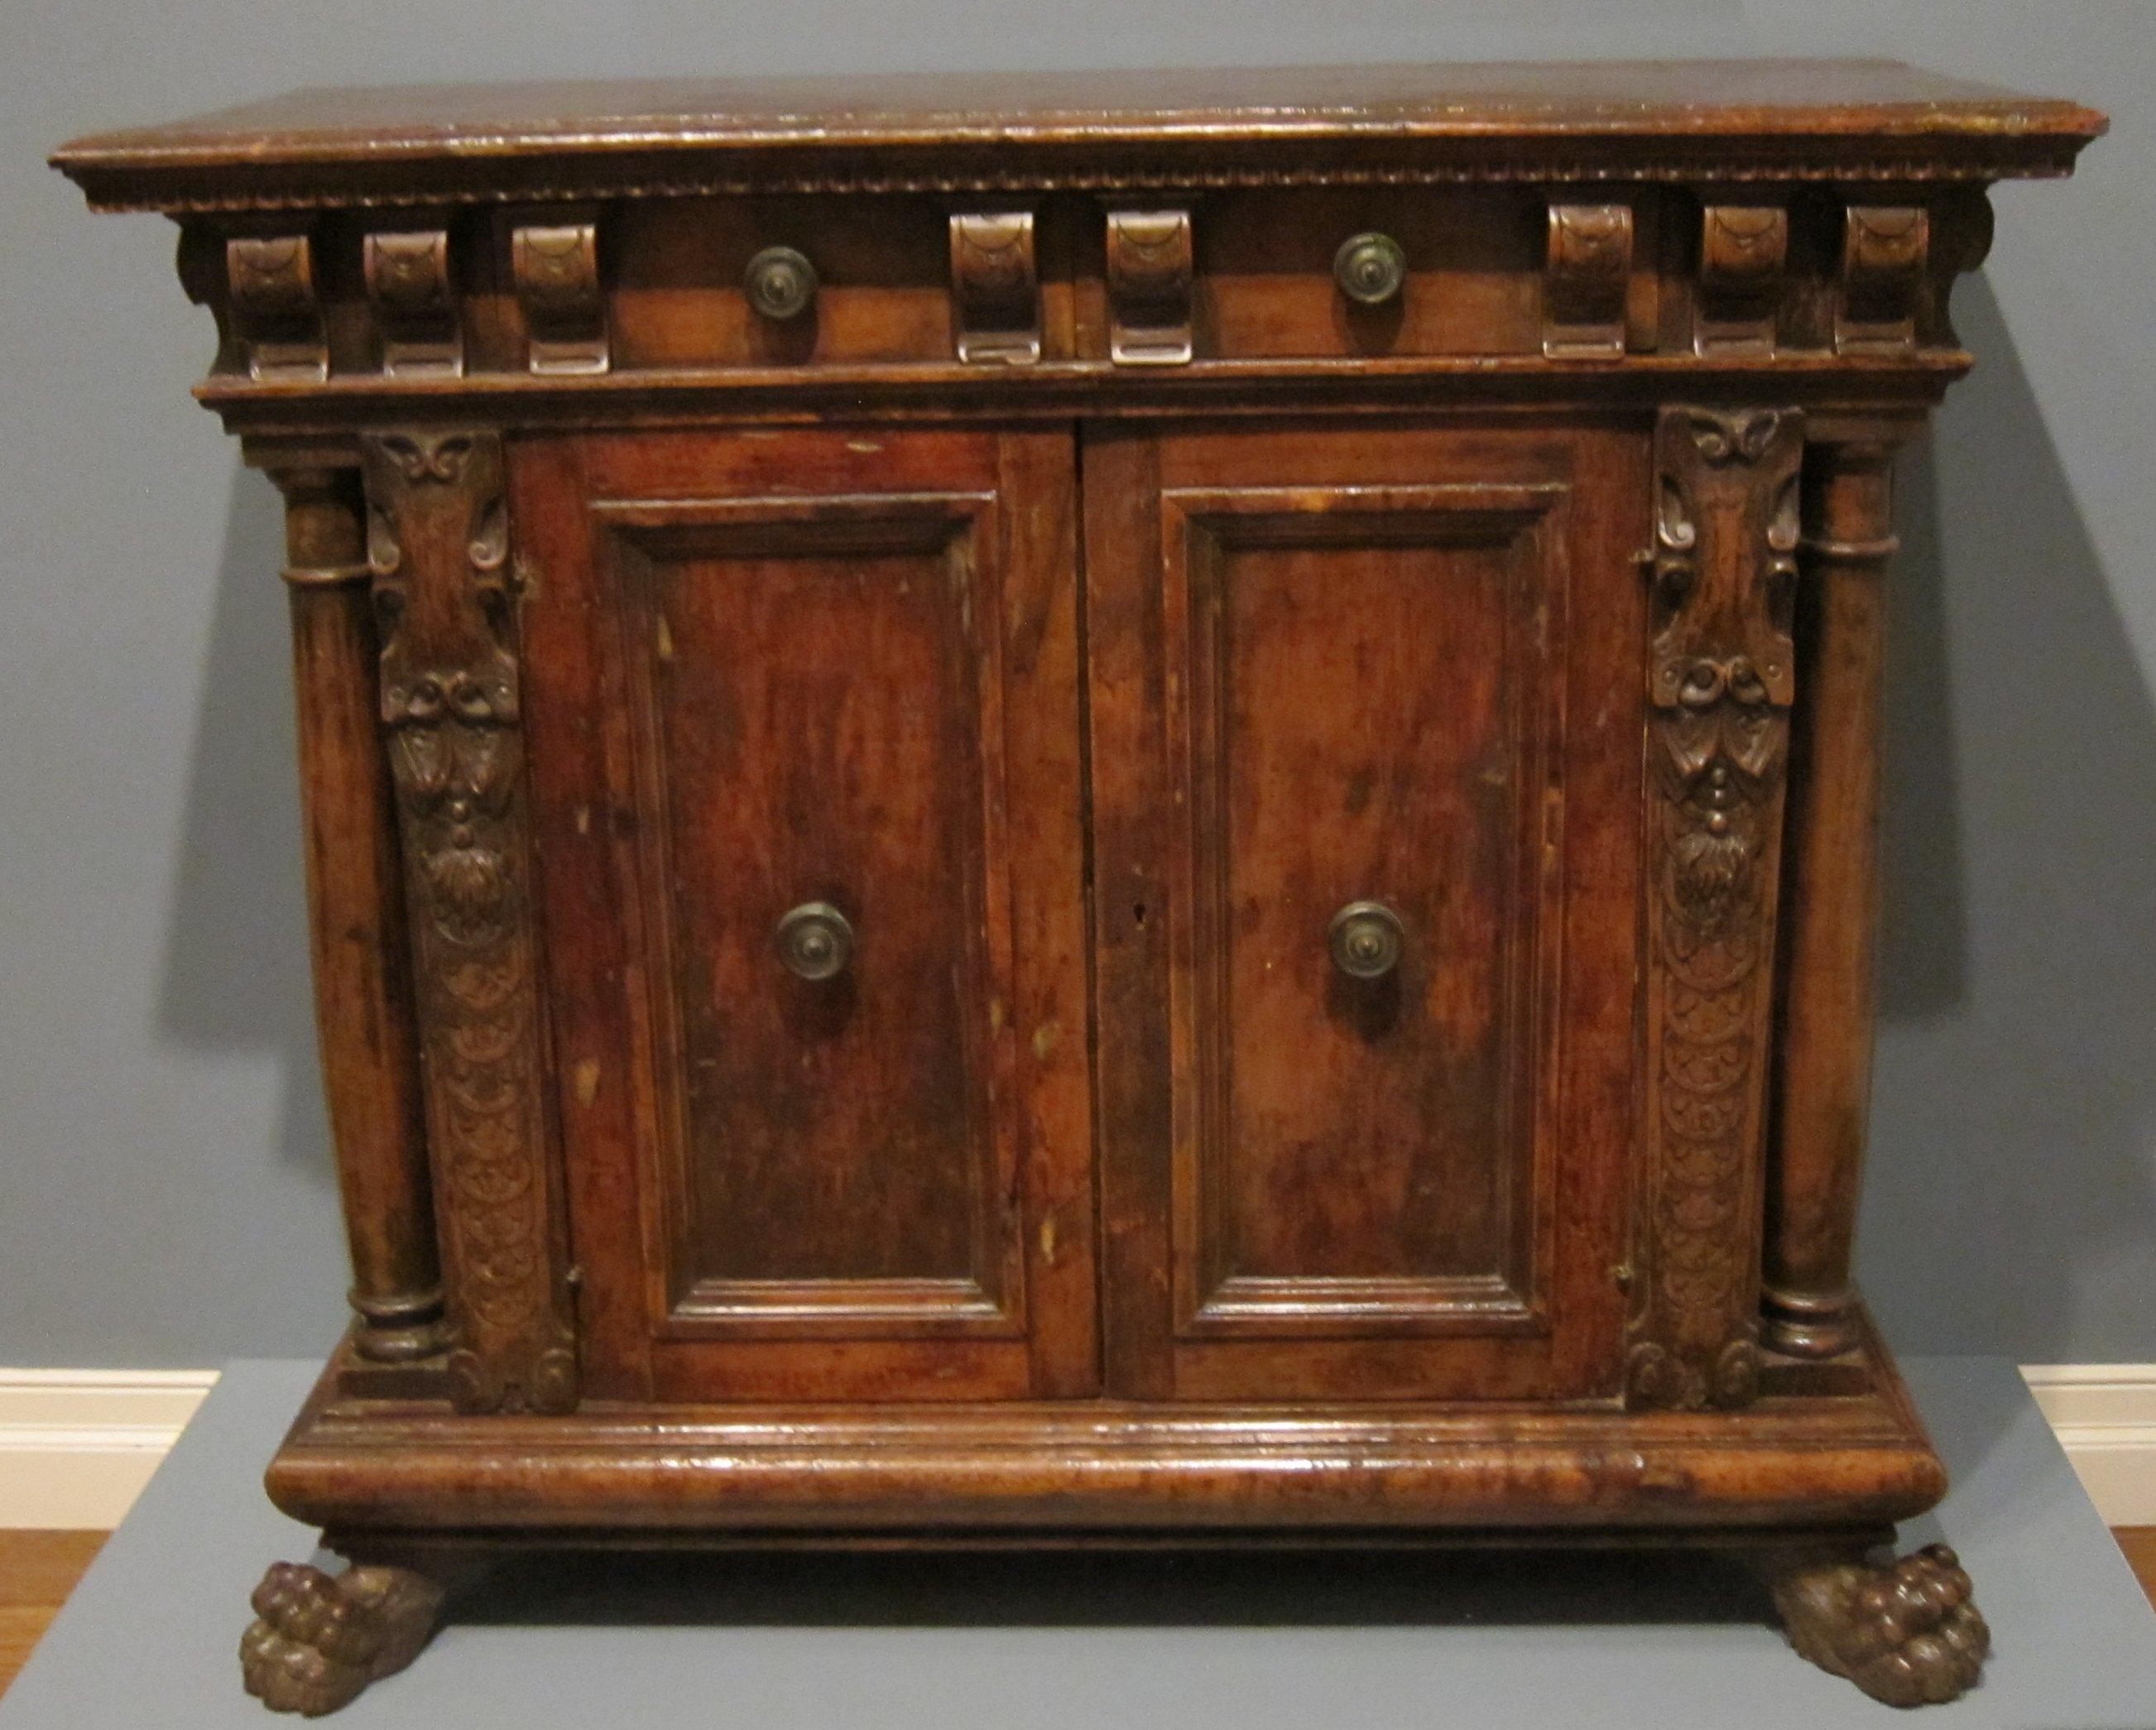 File:15th or 16th century Italian credenza, HAA.JPG - Wikimedia